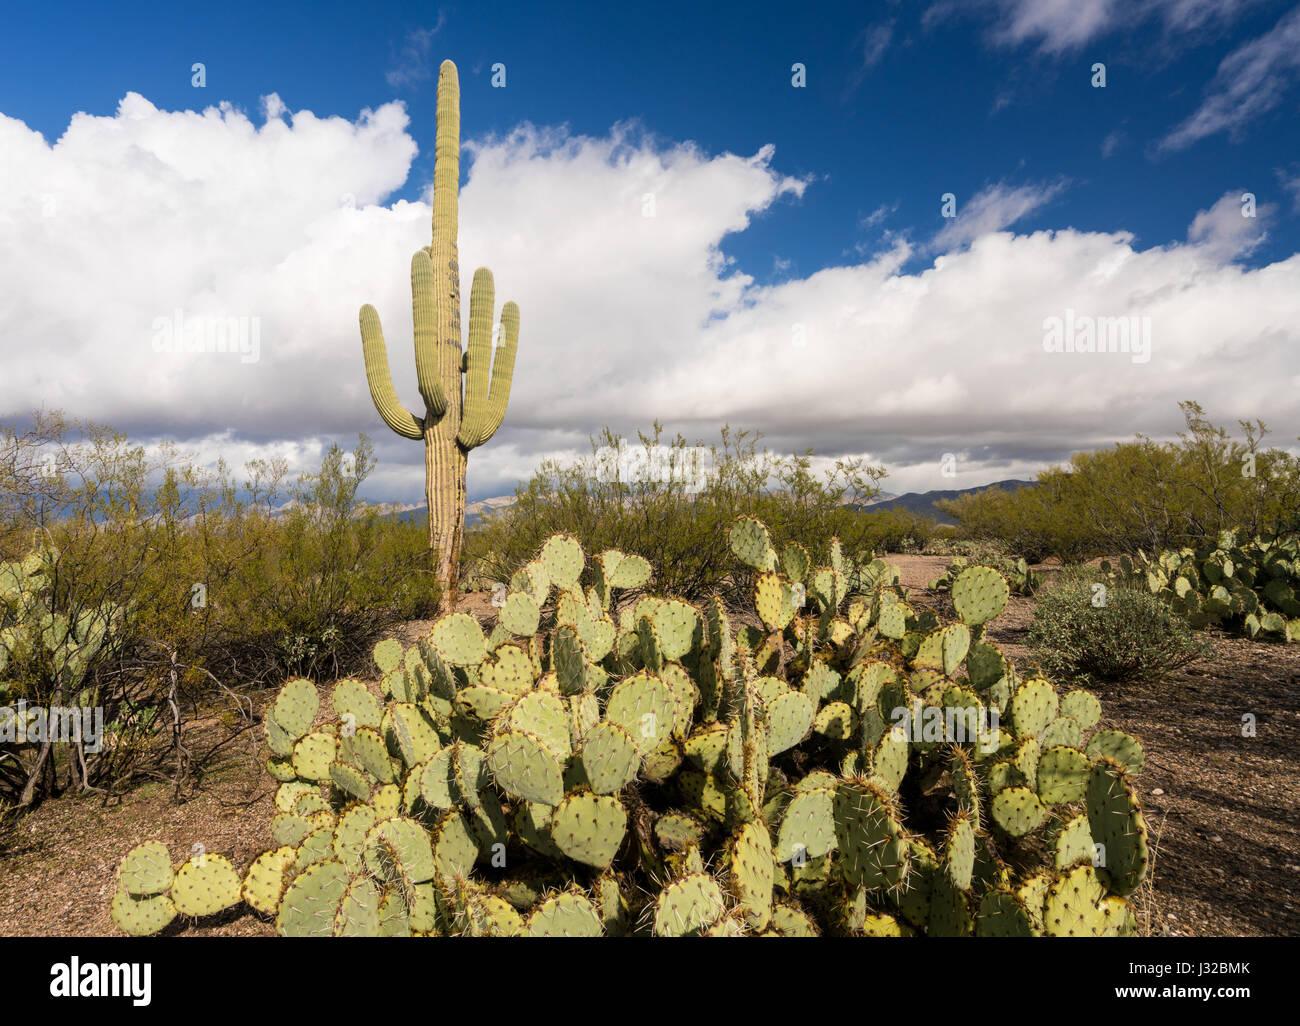 Saguaro cactus plant, Santa Catalina Mountains, Coronado National Forest, near Tucson, Arizona desert, USA - Stock Image